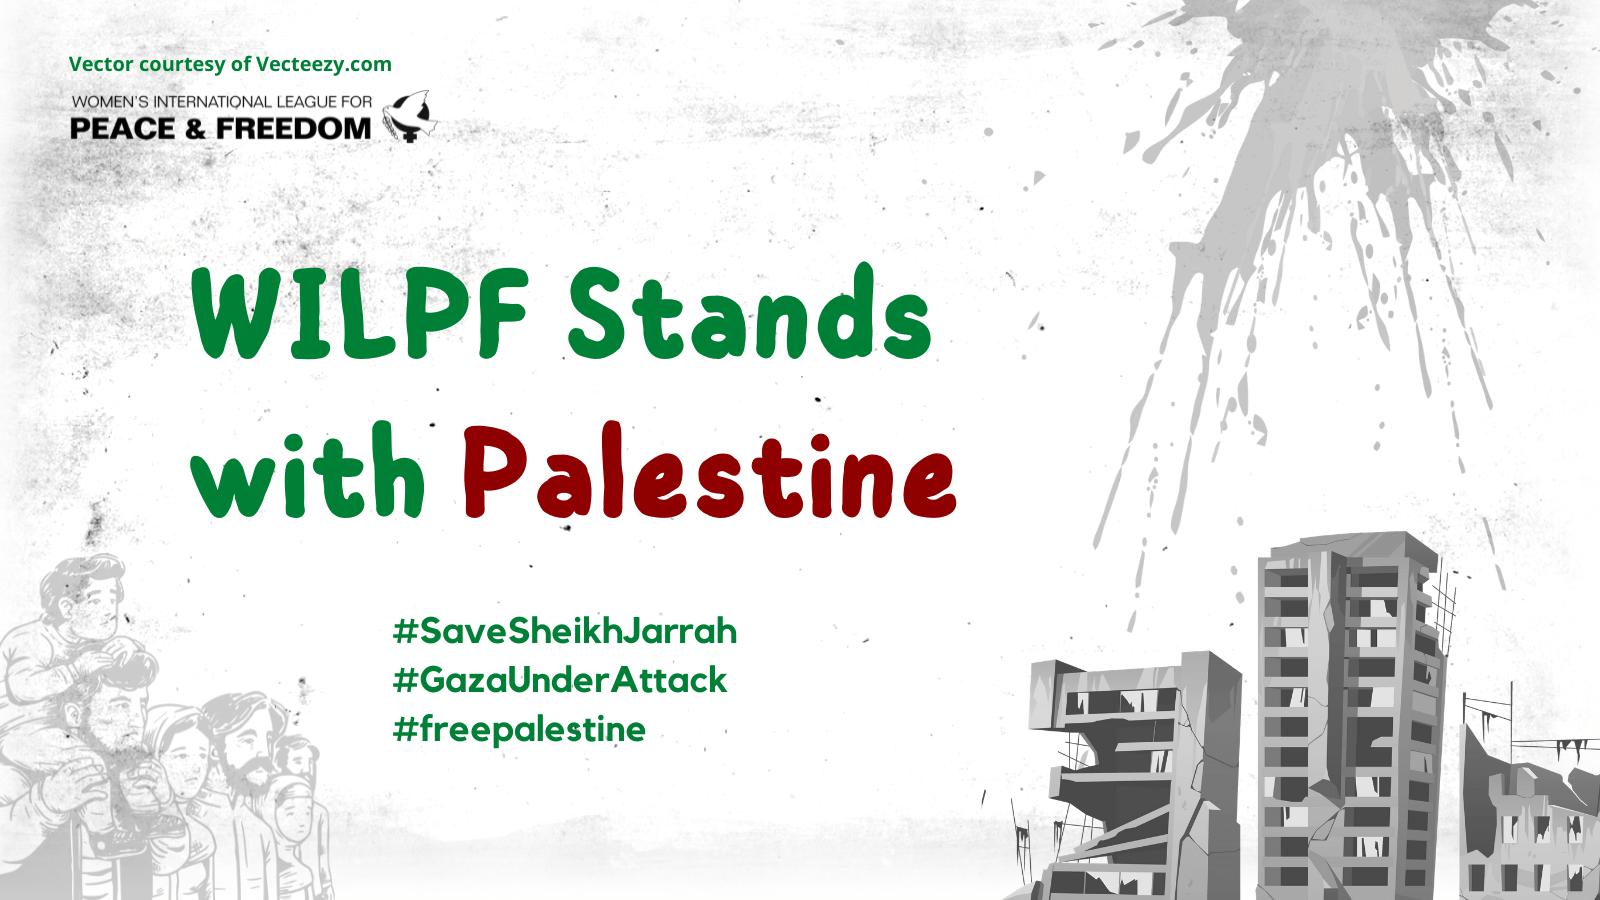 WILPF Stands with Palestine